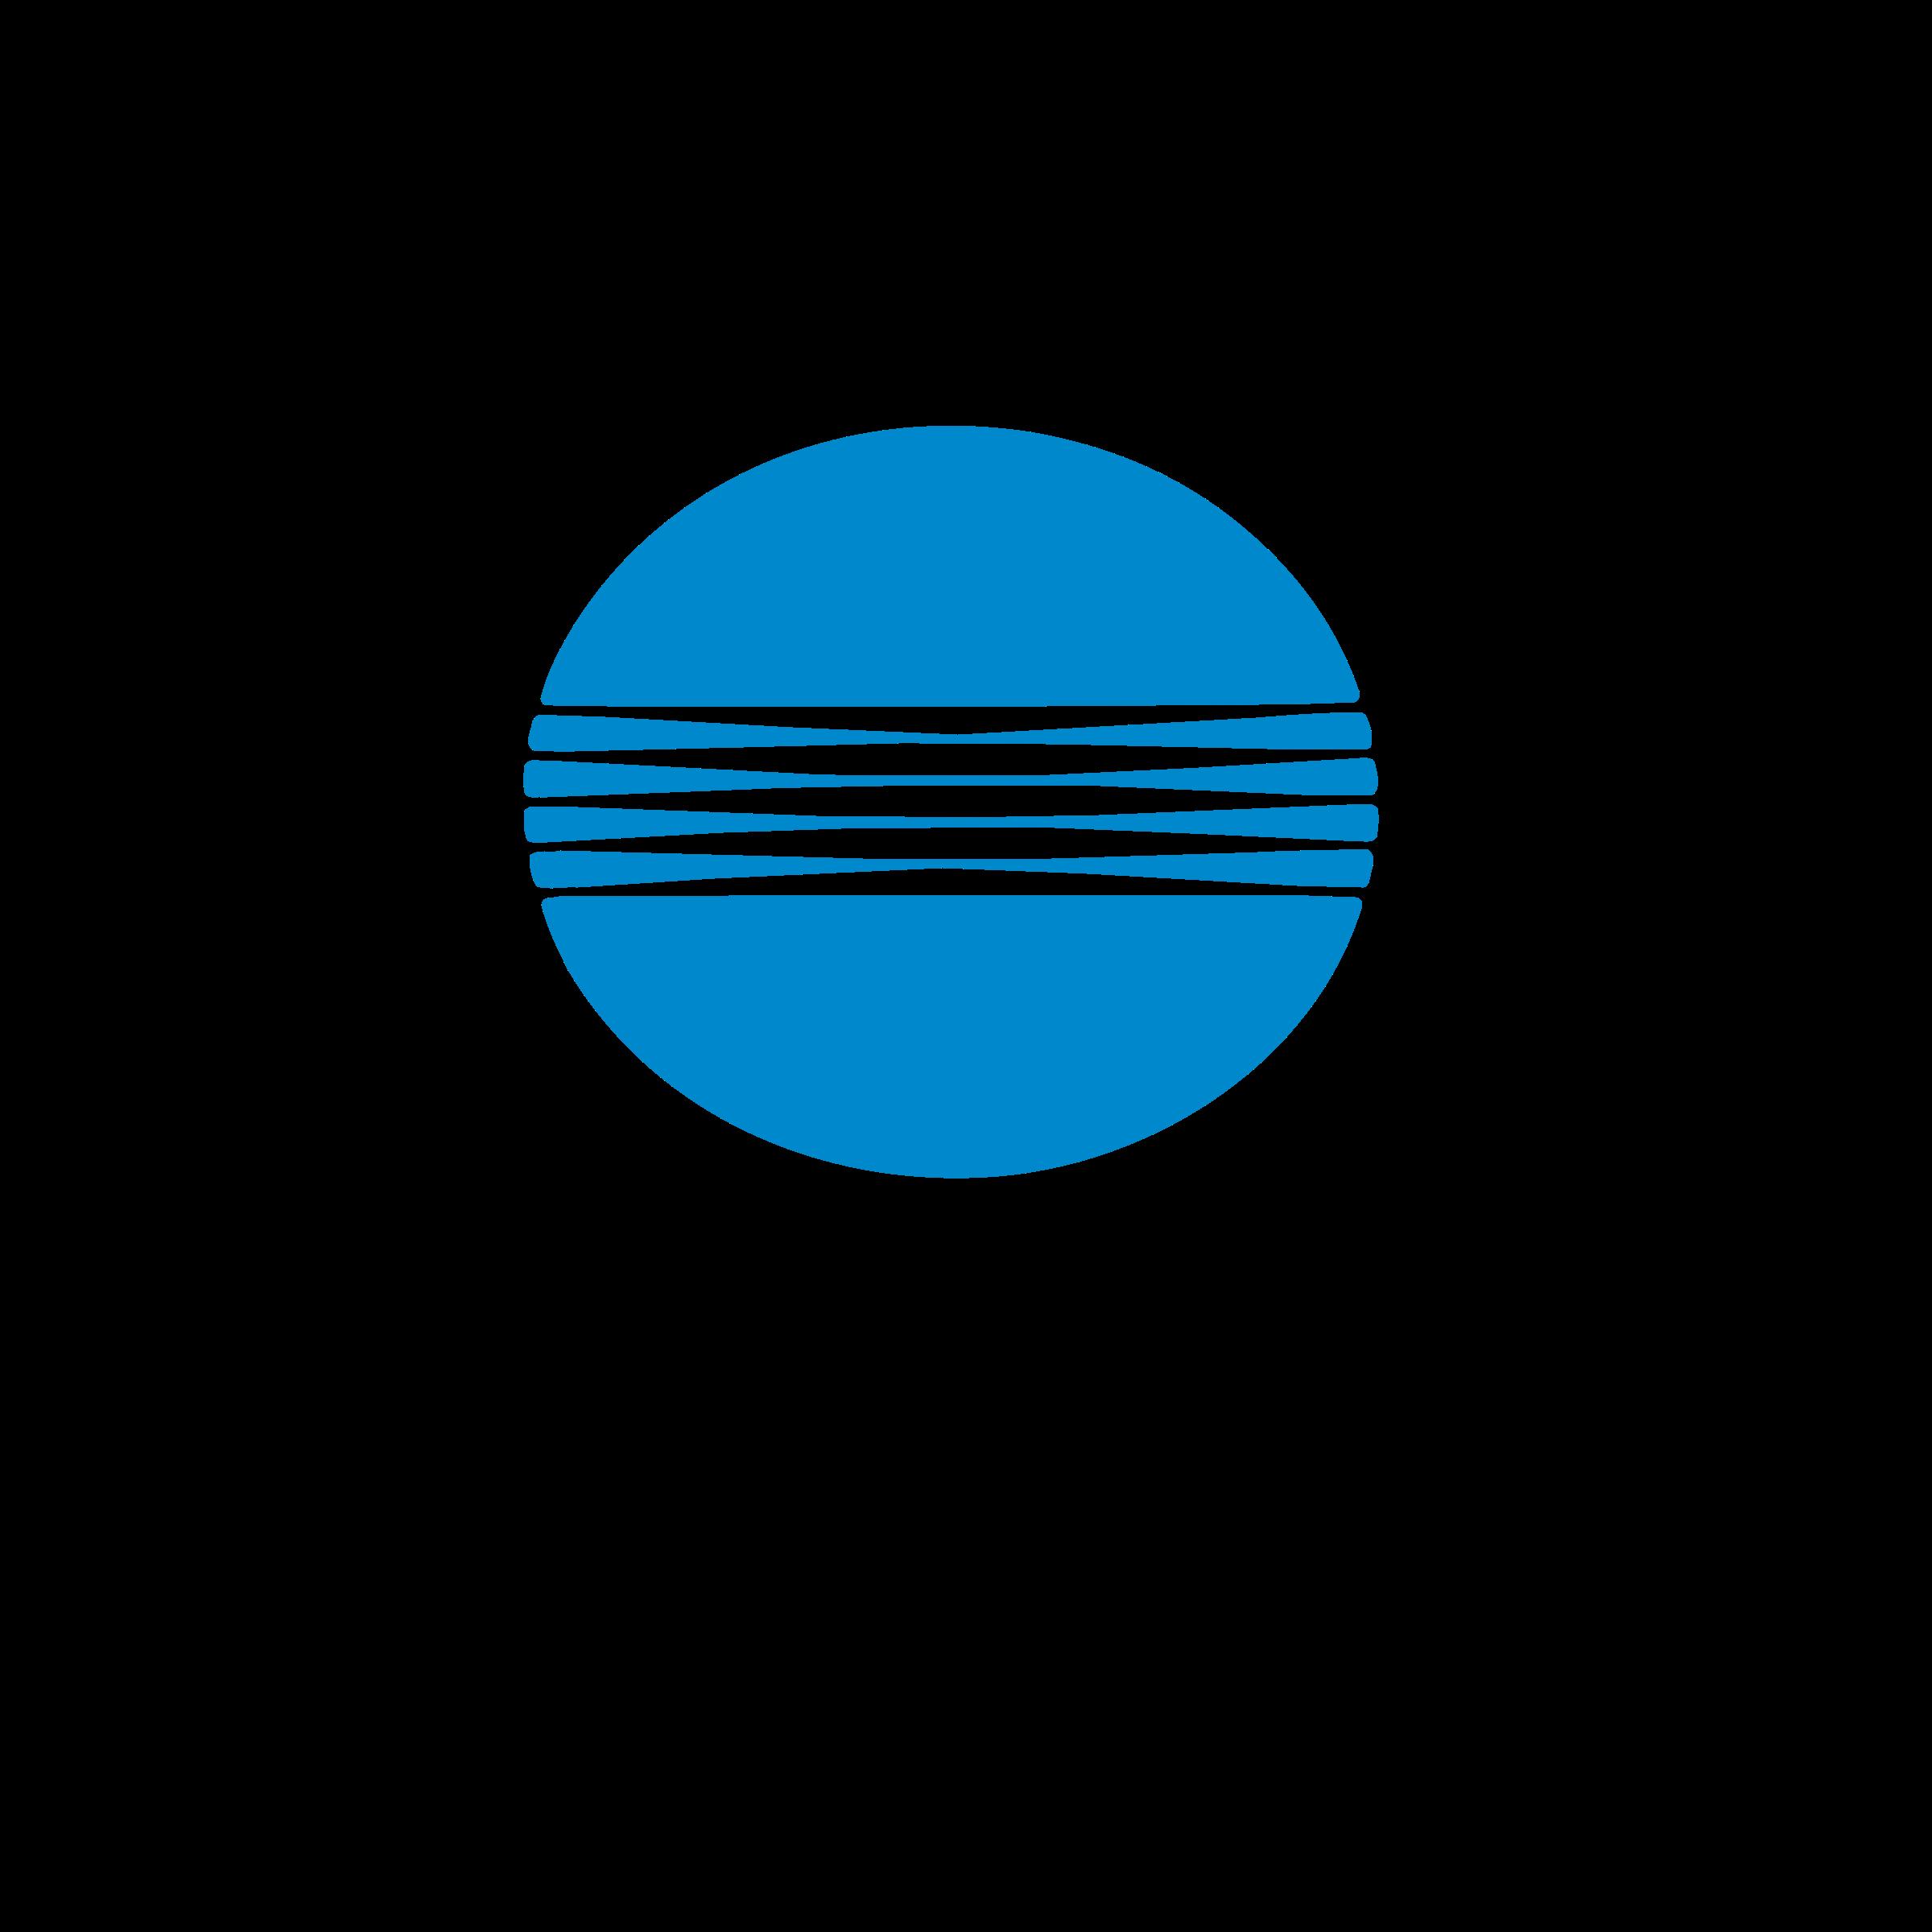 konica minolta logo png transparent amp svg vector freebie